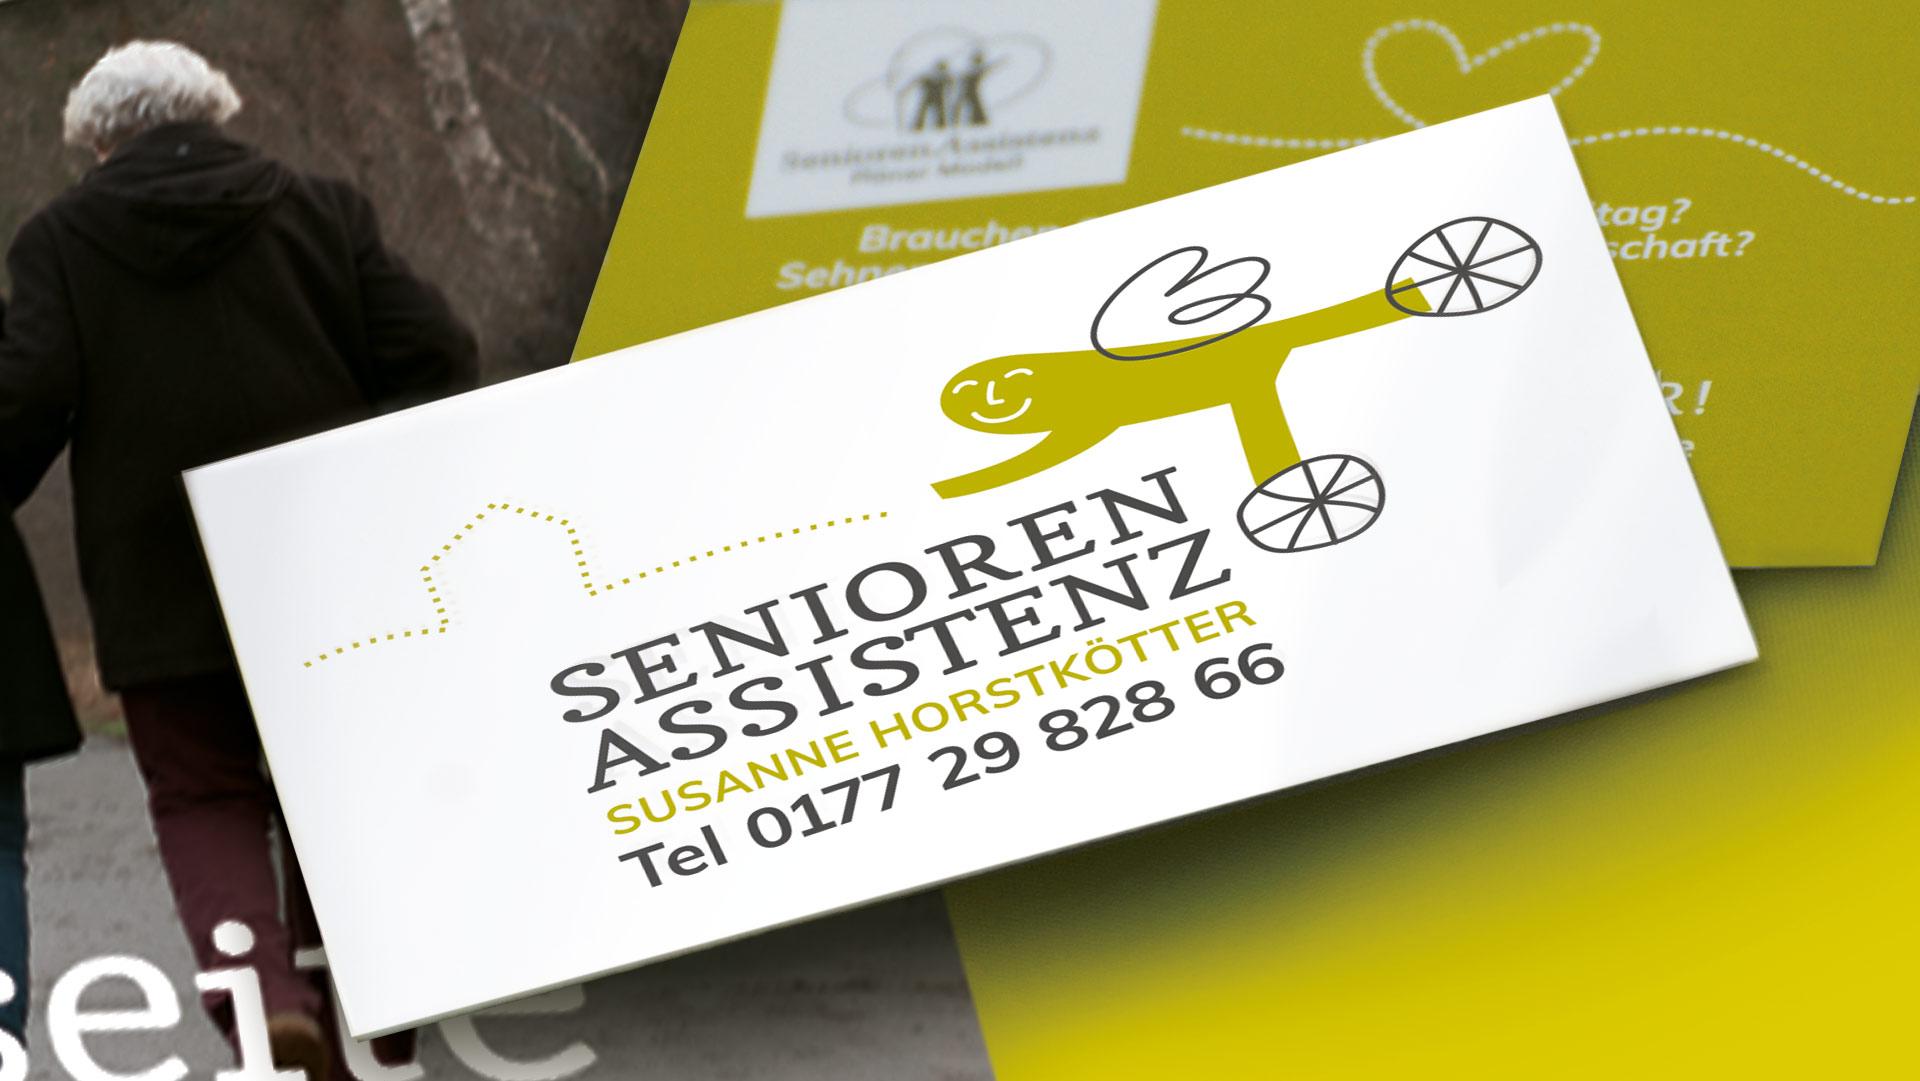 Visitenkarte der Seniorenassistenz Susanne Horstkötter